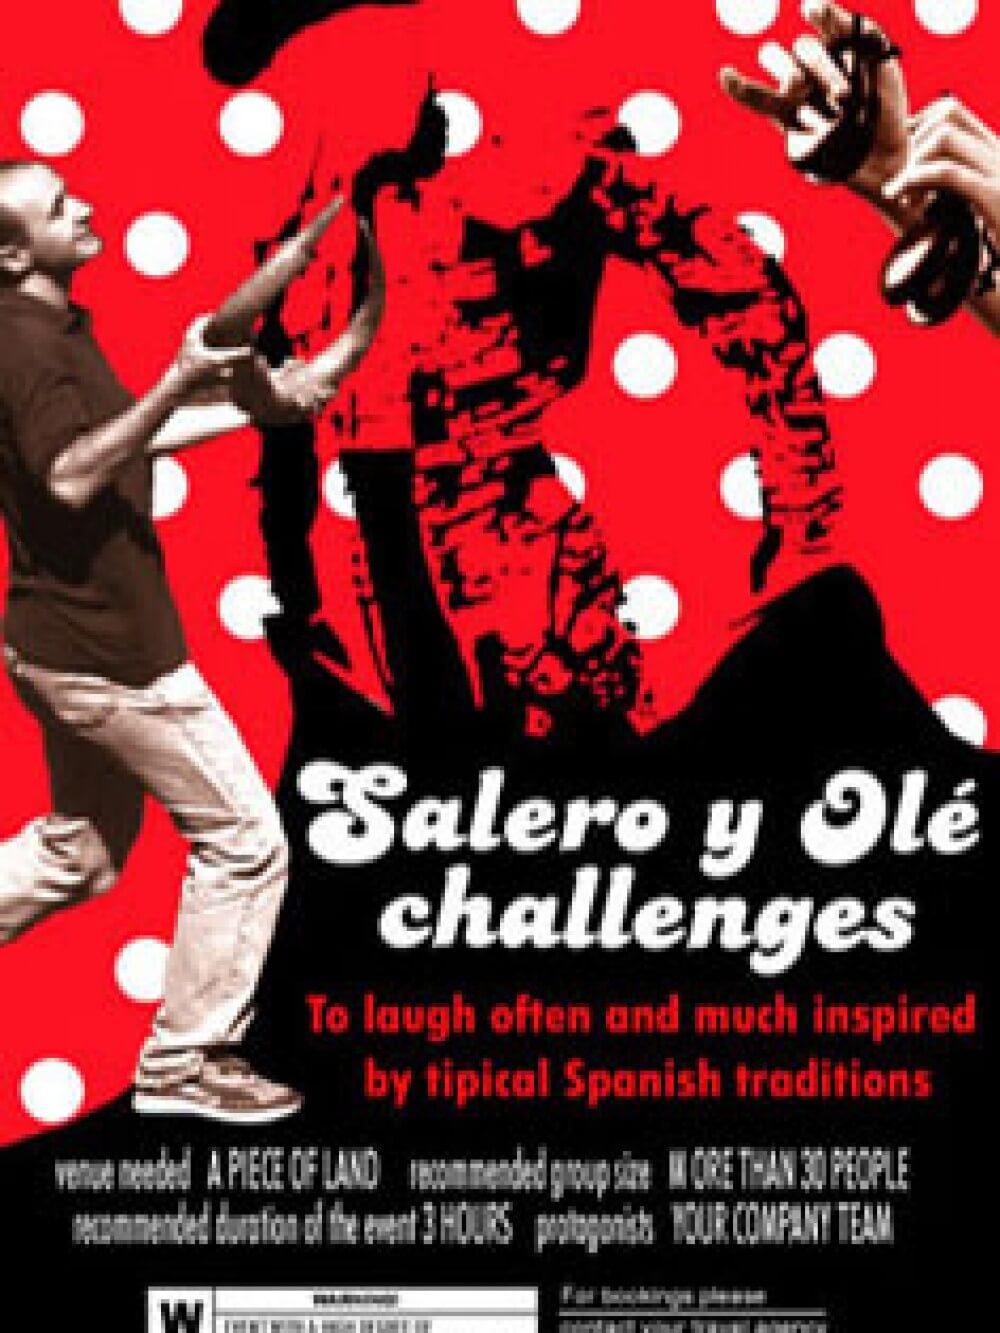 salero_y_ole_challenges_vertical_web